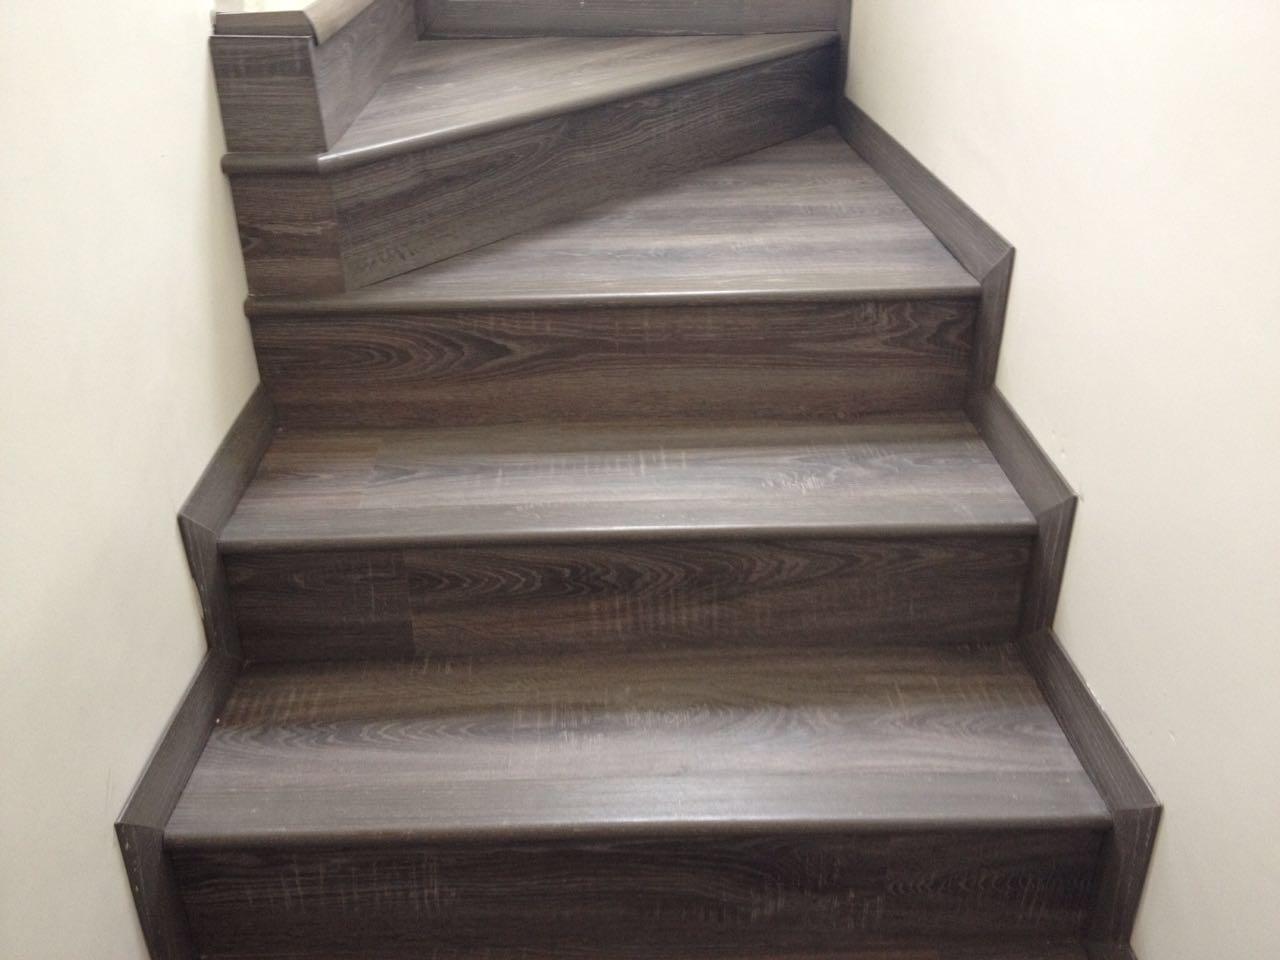 Forrar escaleras de madera perfect estilo rustico escalera rustica with forrar escalera de - Como forrar una escalera de madera ...